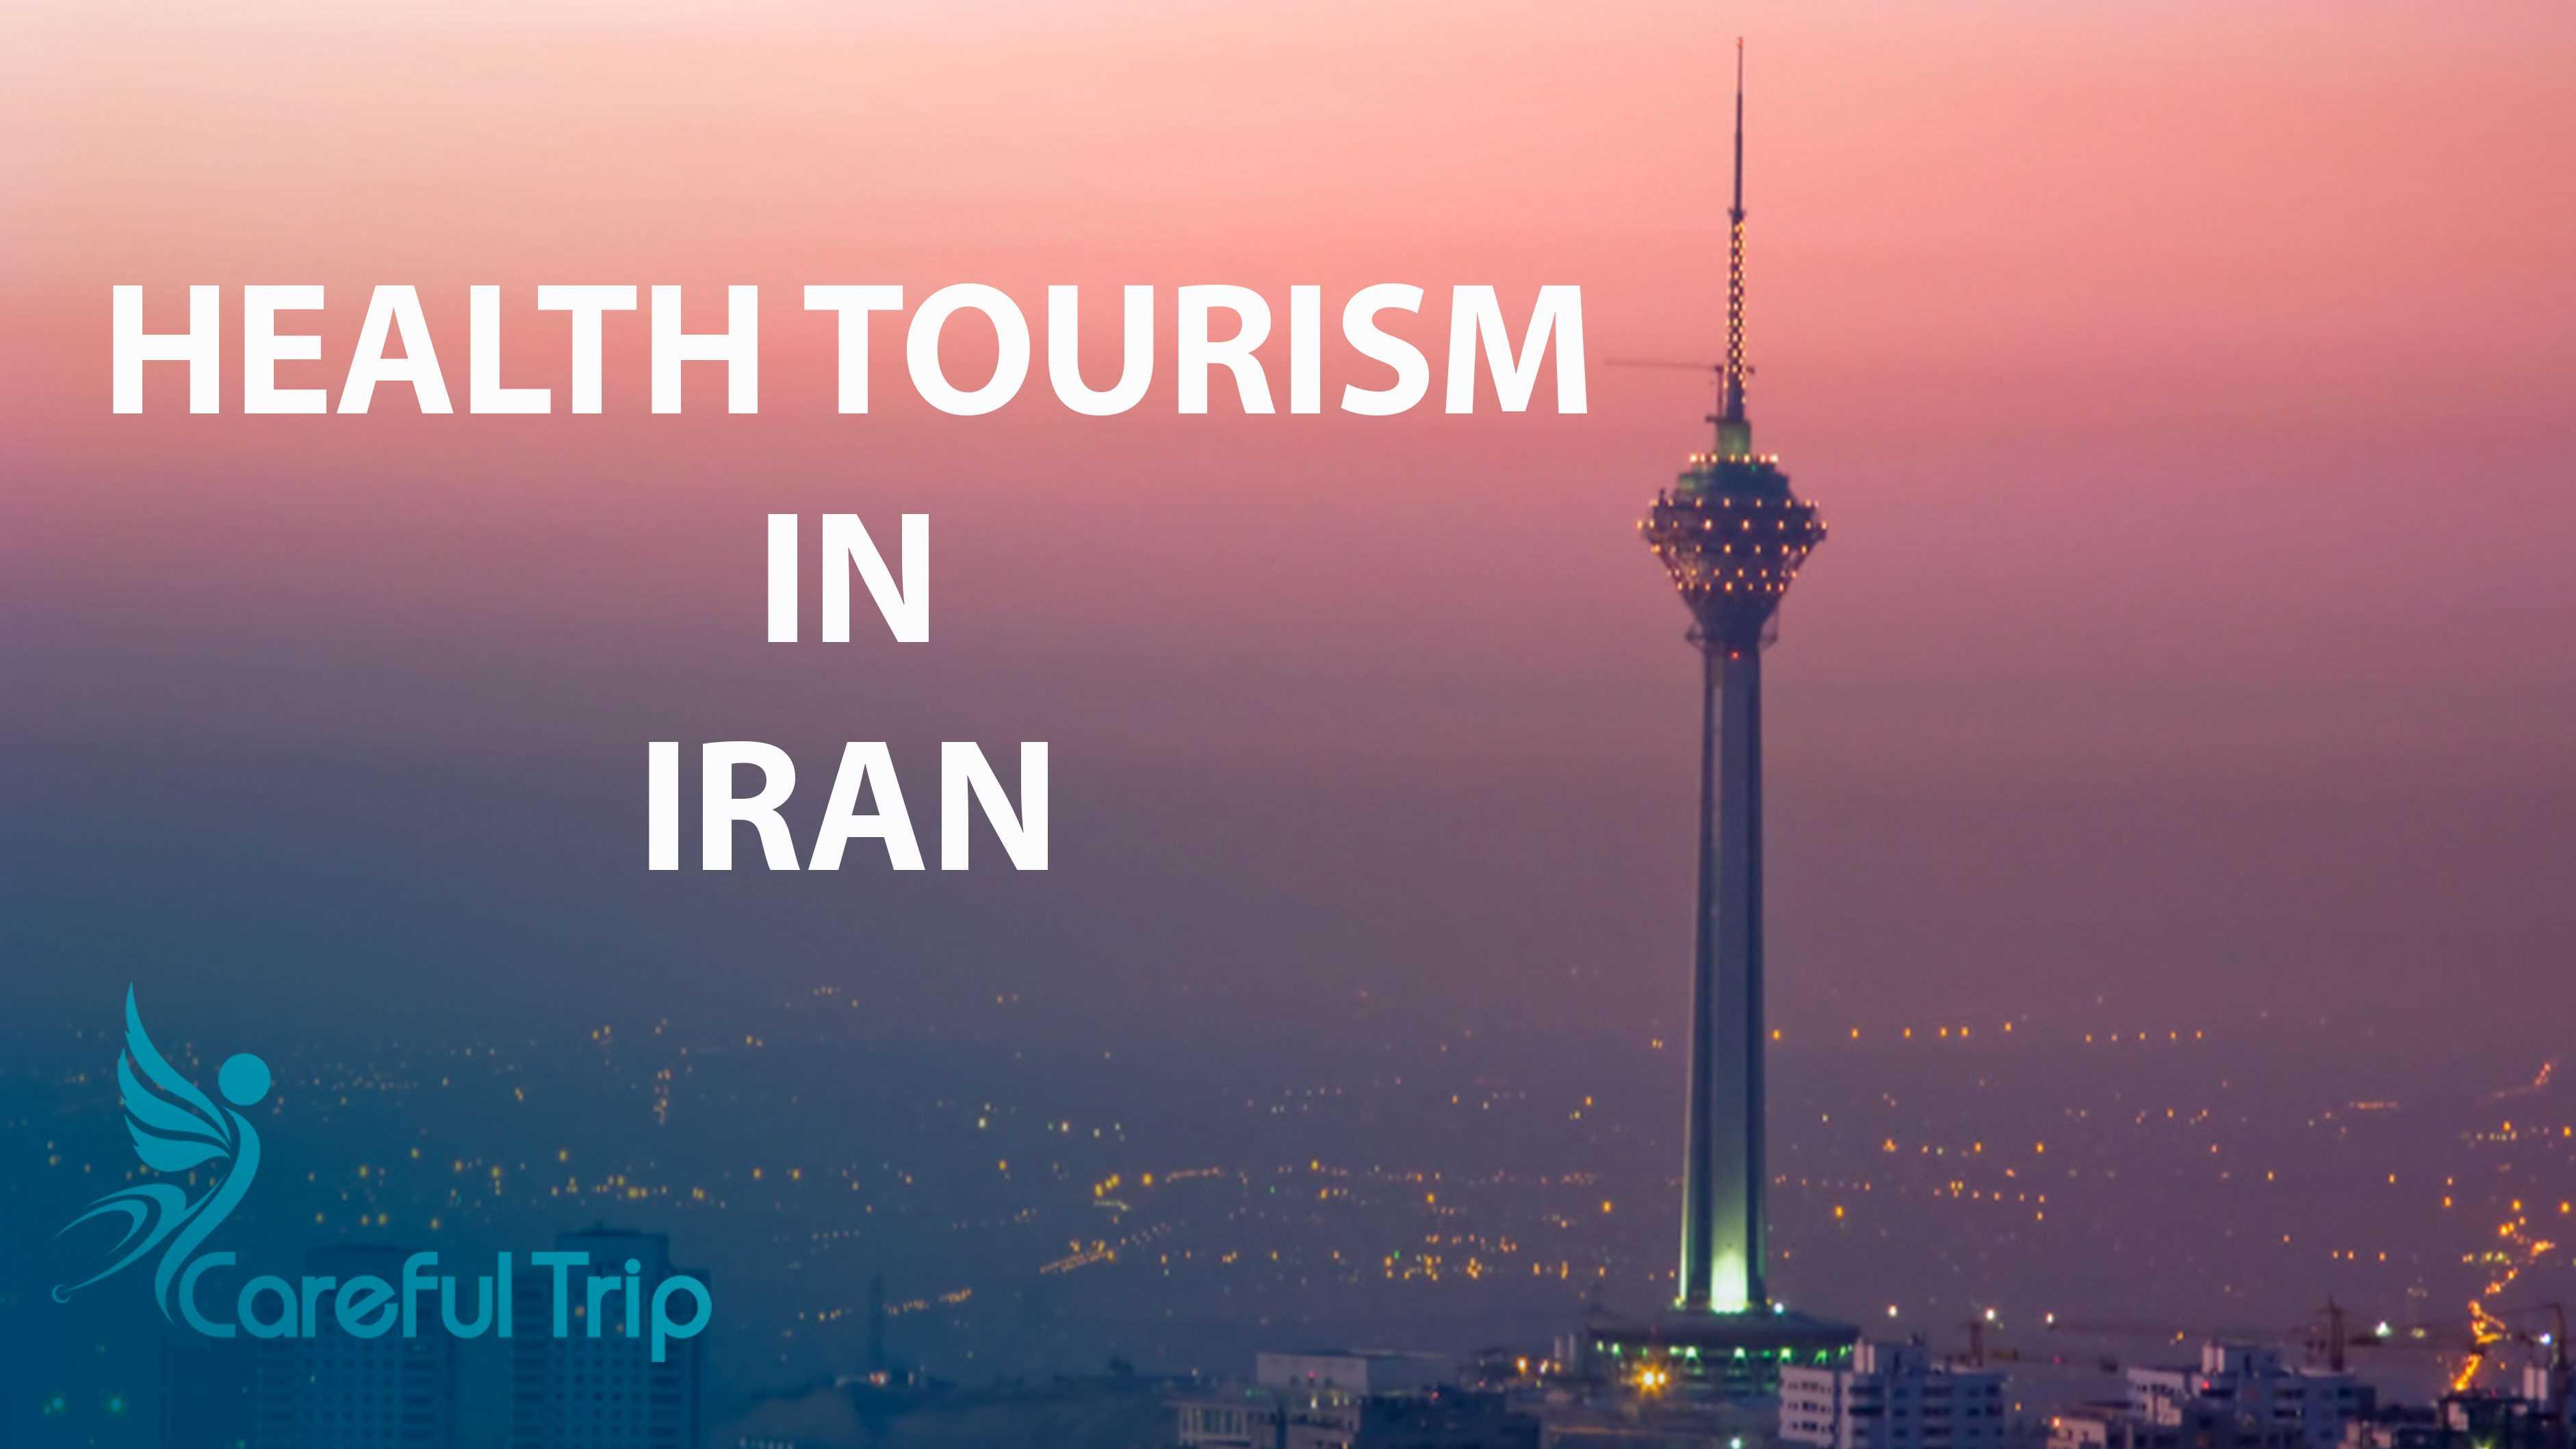 health-tourism-in-iran-2op1618994419